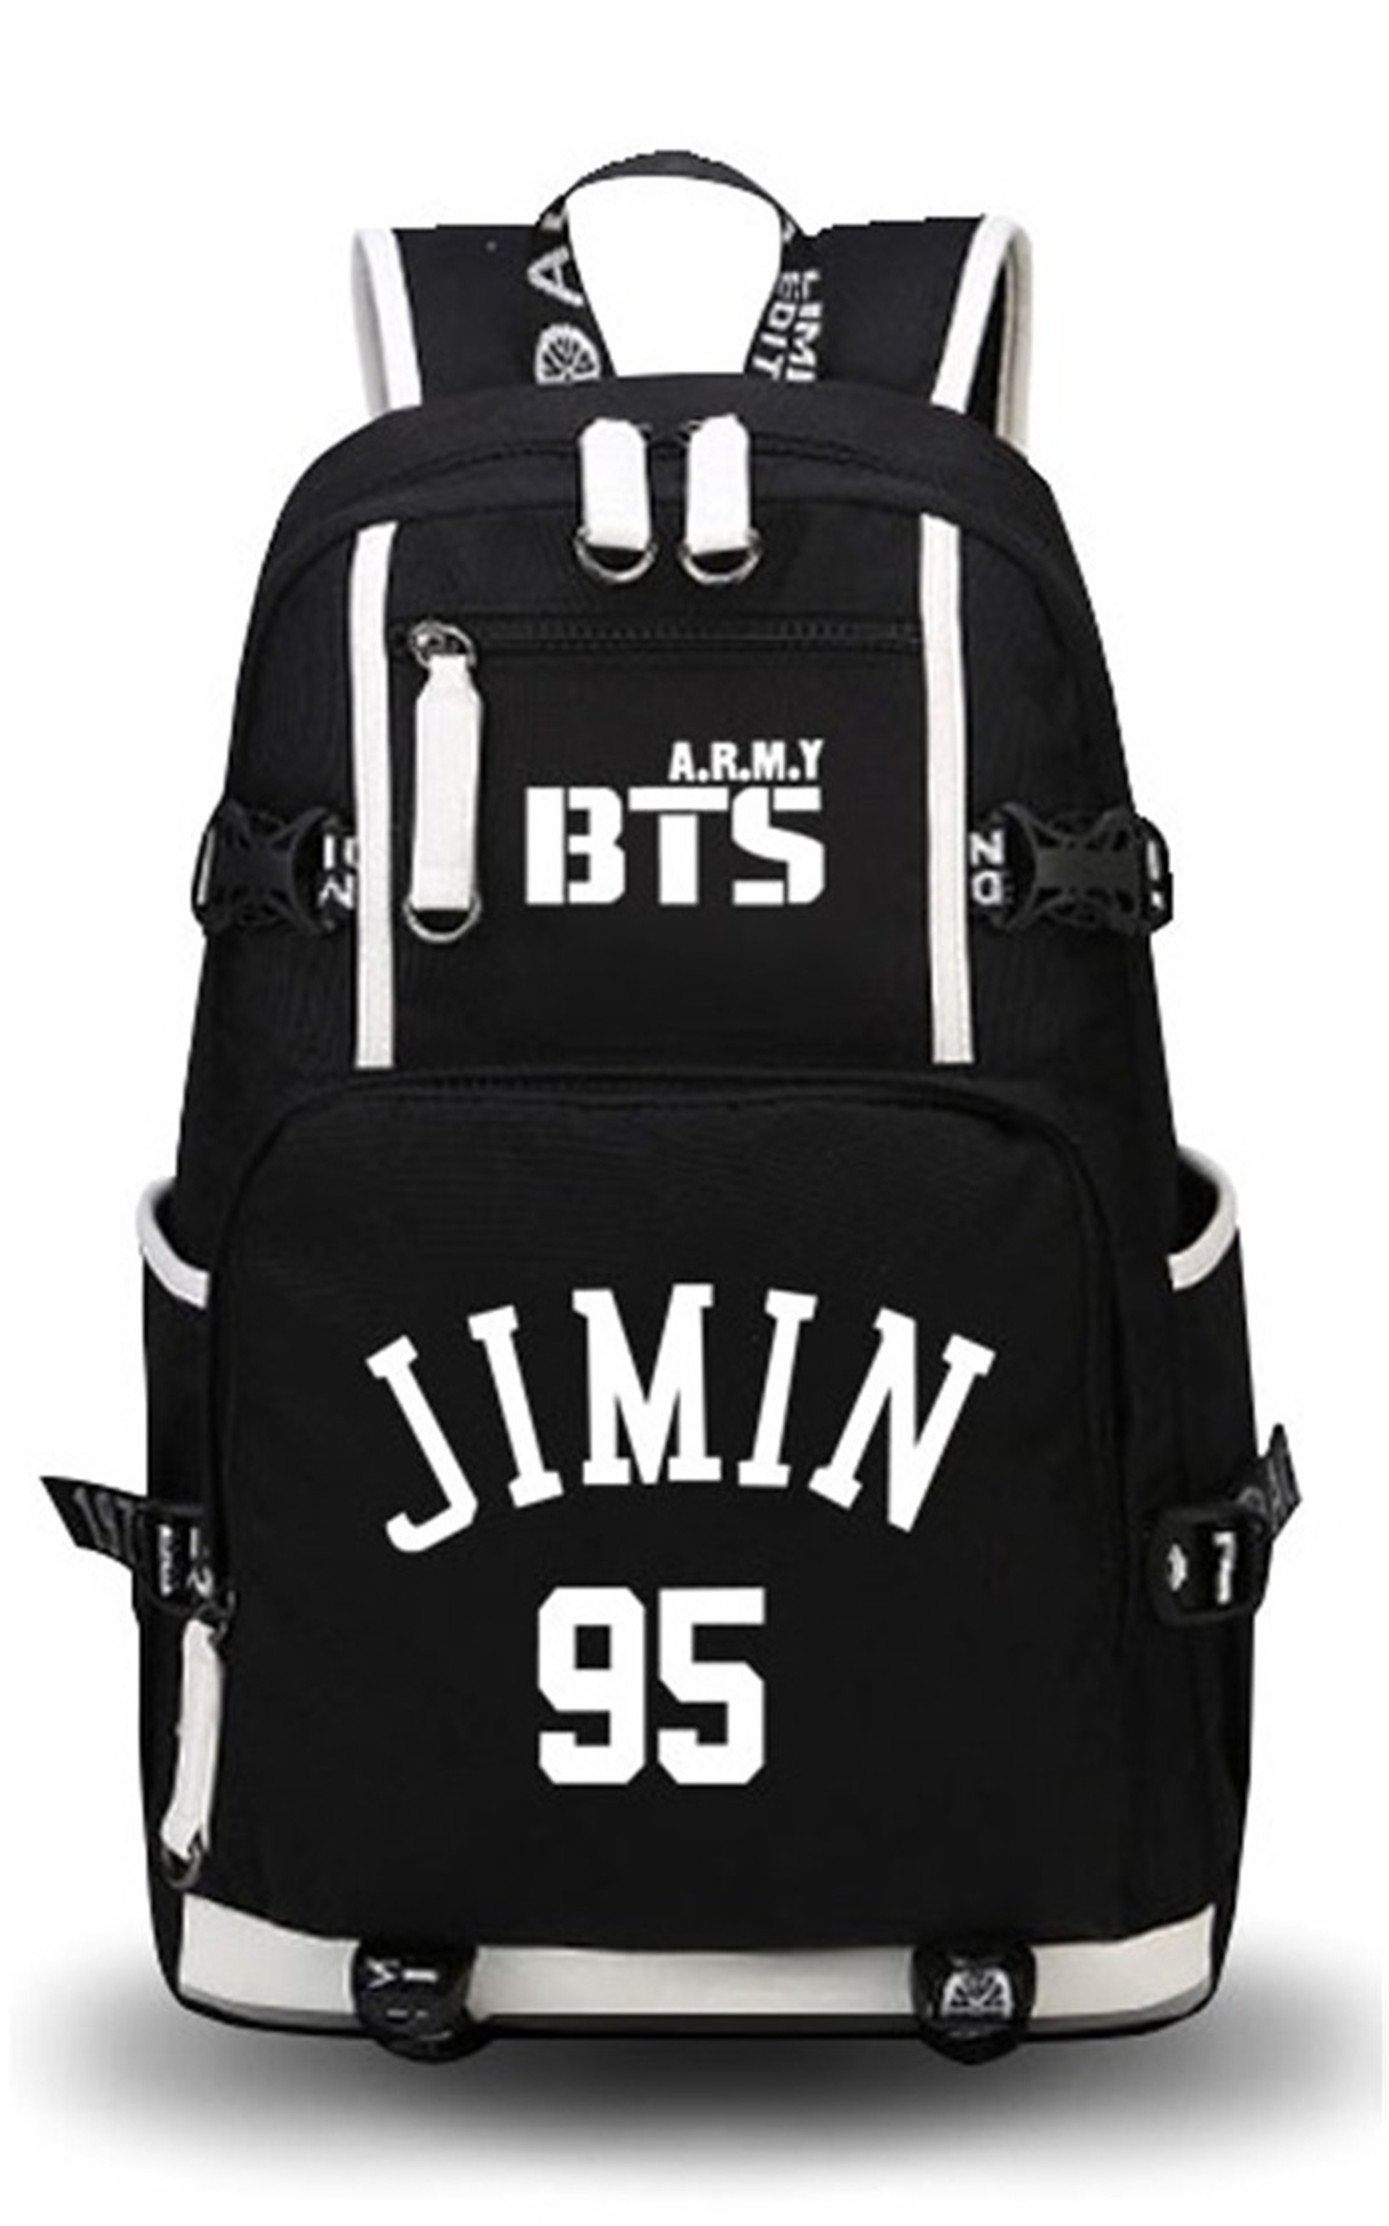 JUSTGOGO Luminous KPOP Bangtan Boys BTS Daypack Laptop Bag College Bag Bookbag School Bag Backpack